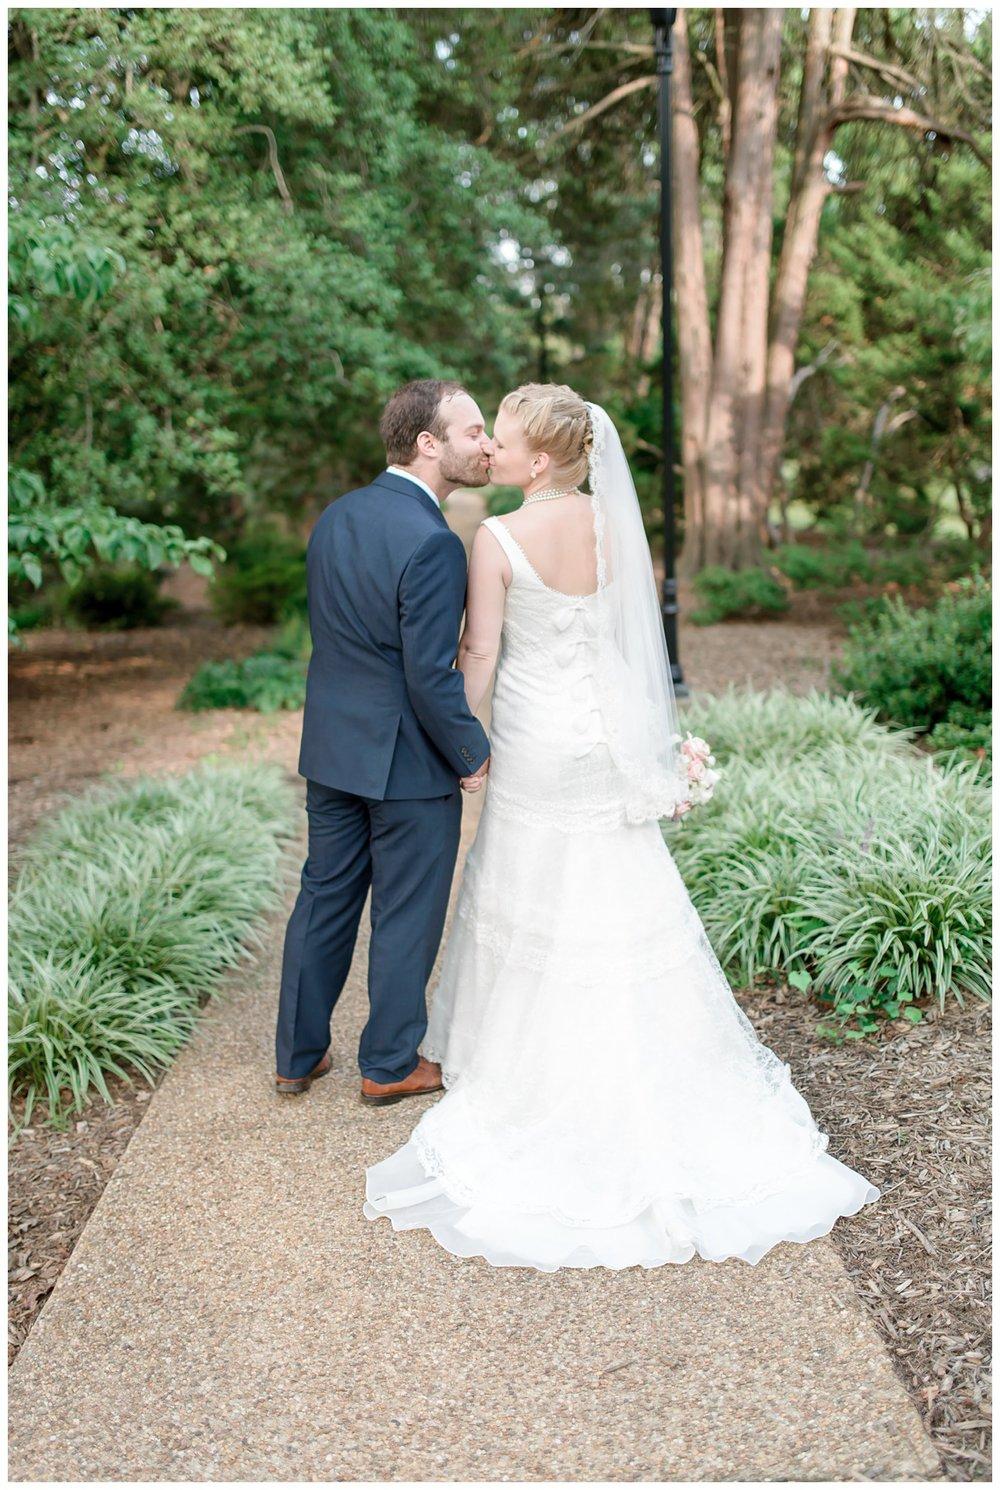 Della and Andrew Wedding Photos_Hendry House Arlington Virginia_Stephanie Kopf Photography_Northern Virginia Wedding Photography-69.jpg